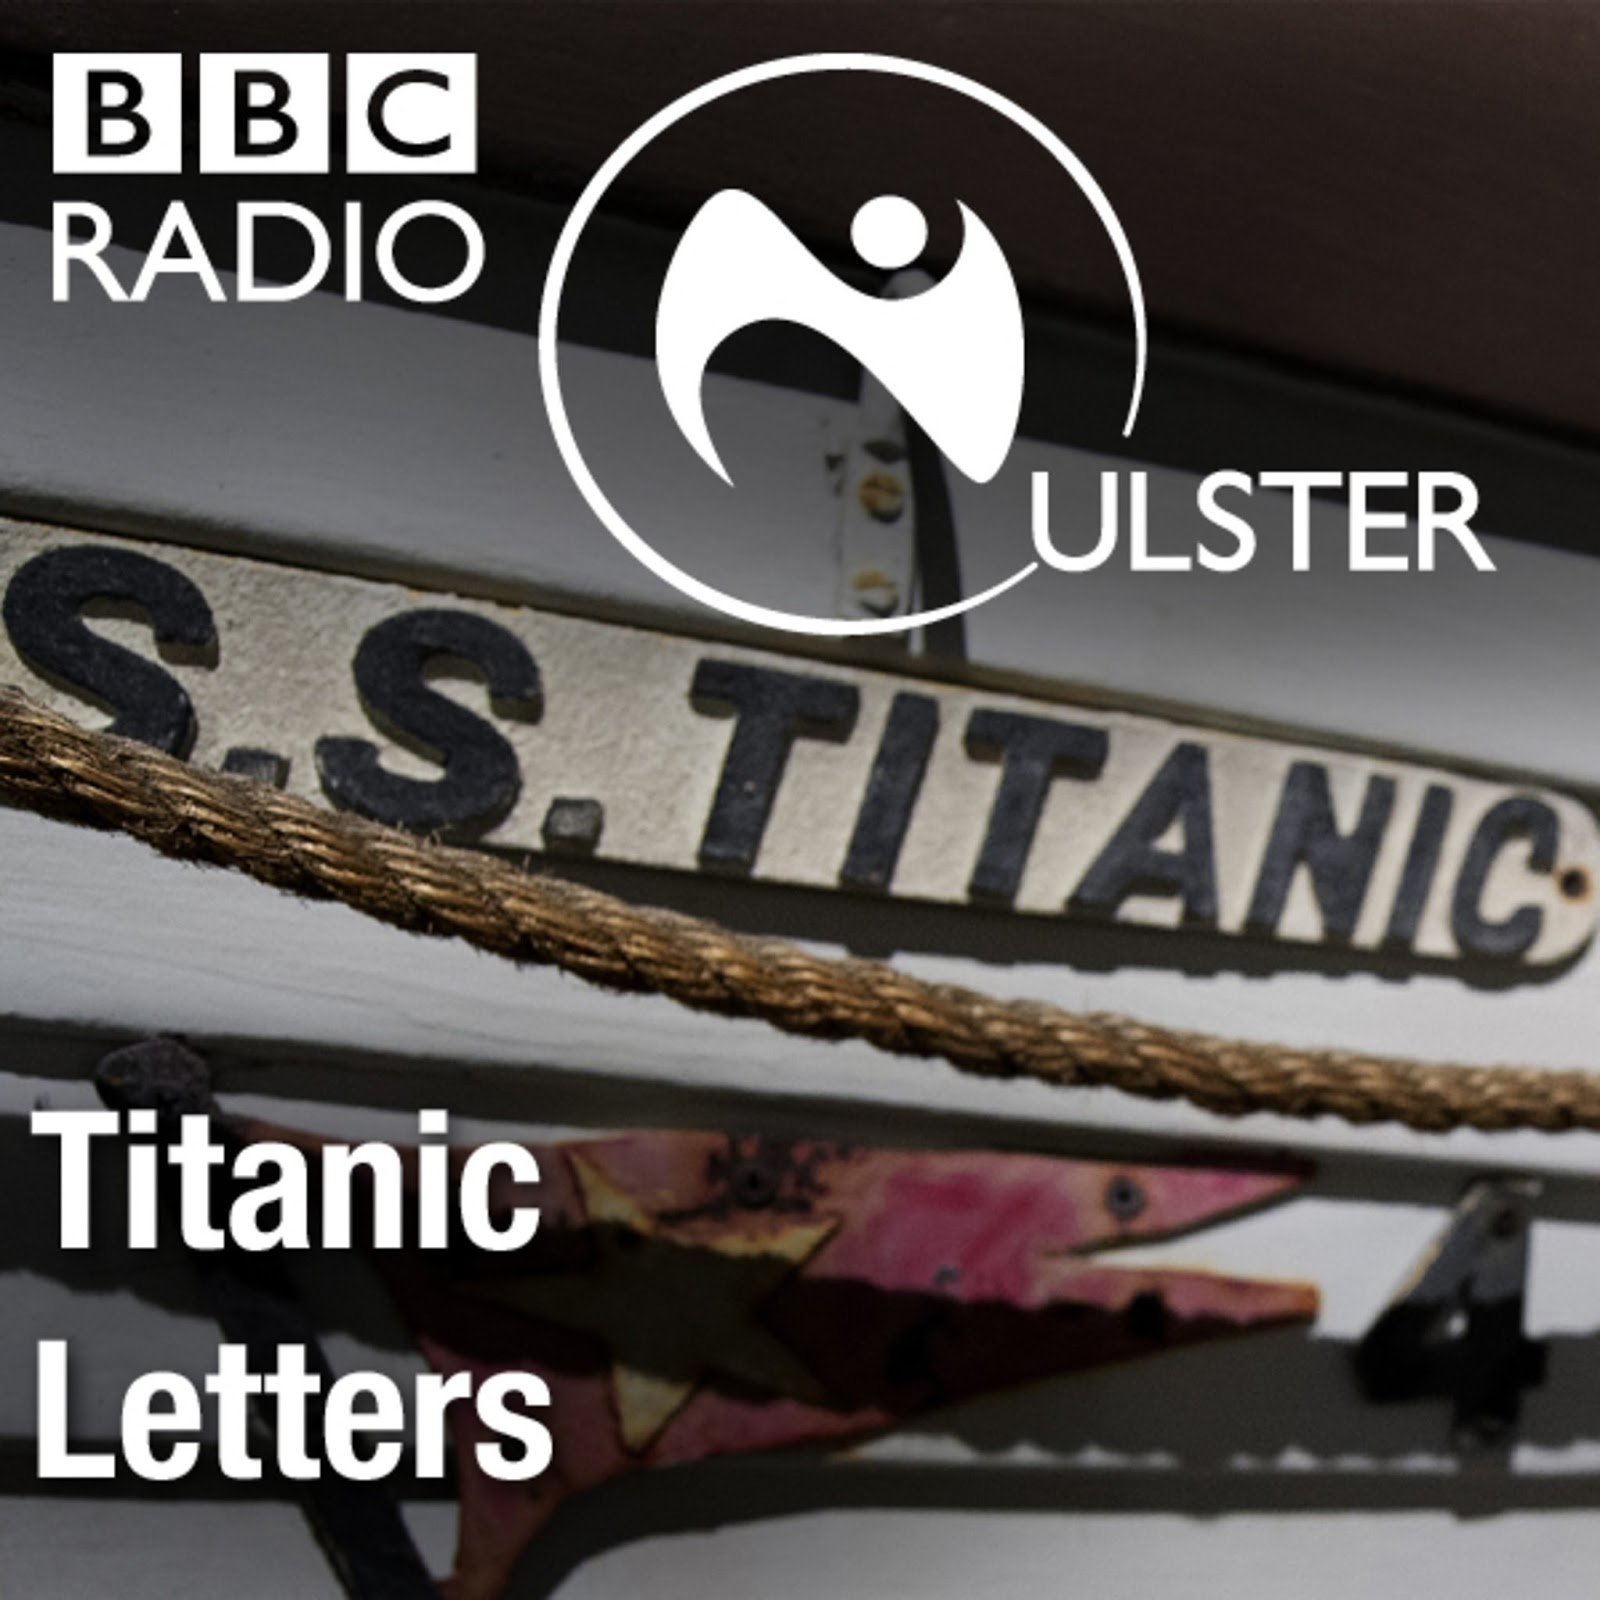 https://4.bp.blogspot.com/-AtYWvGgf4uI/VxMjzuTQPcI/AAAAAAAACe4/liWOgvGrRG4F45O6f2udzfWG2axItcNDwCLcB/s1600/Titanic%2BLetters%2BLogo.jpg